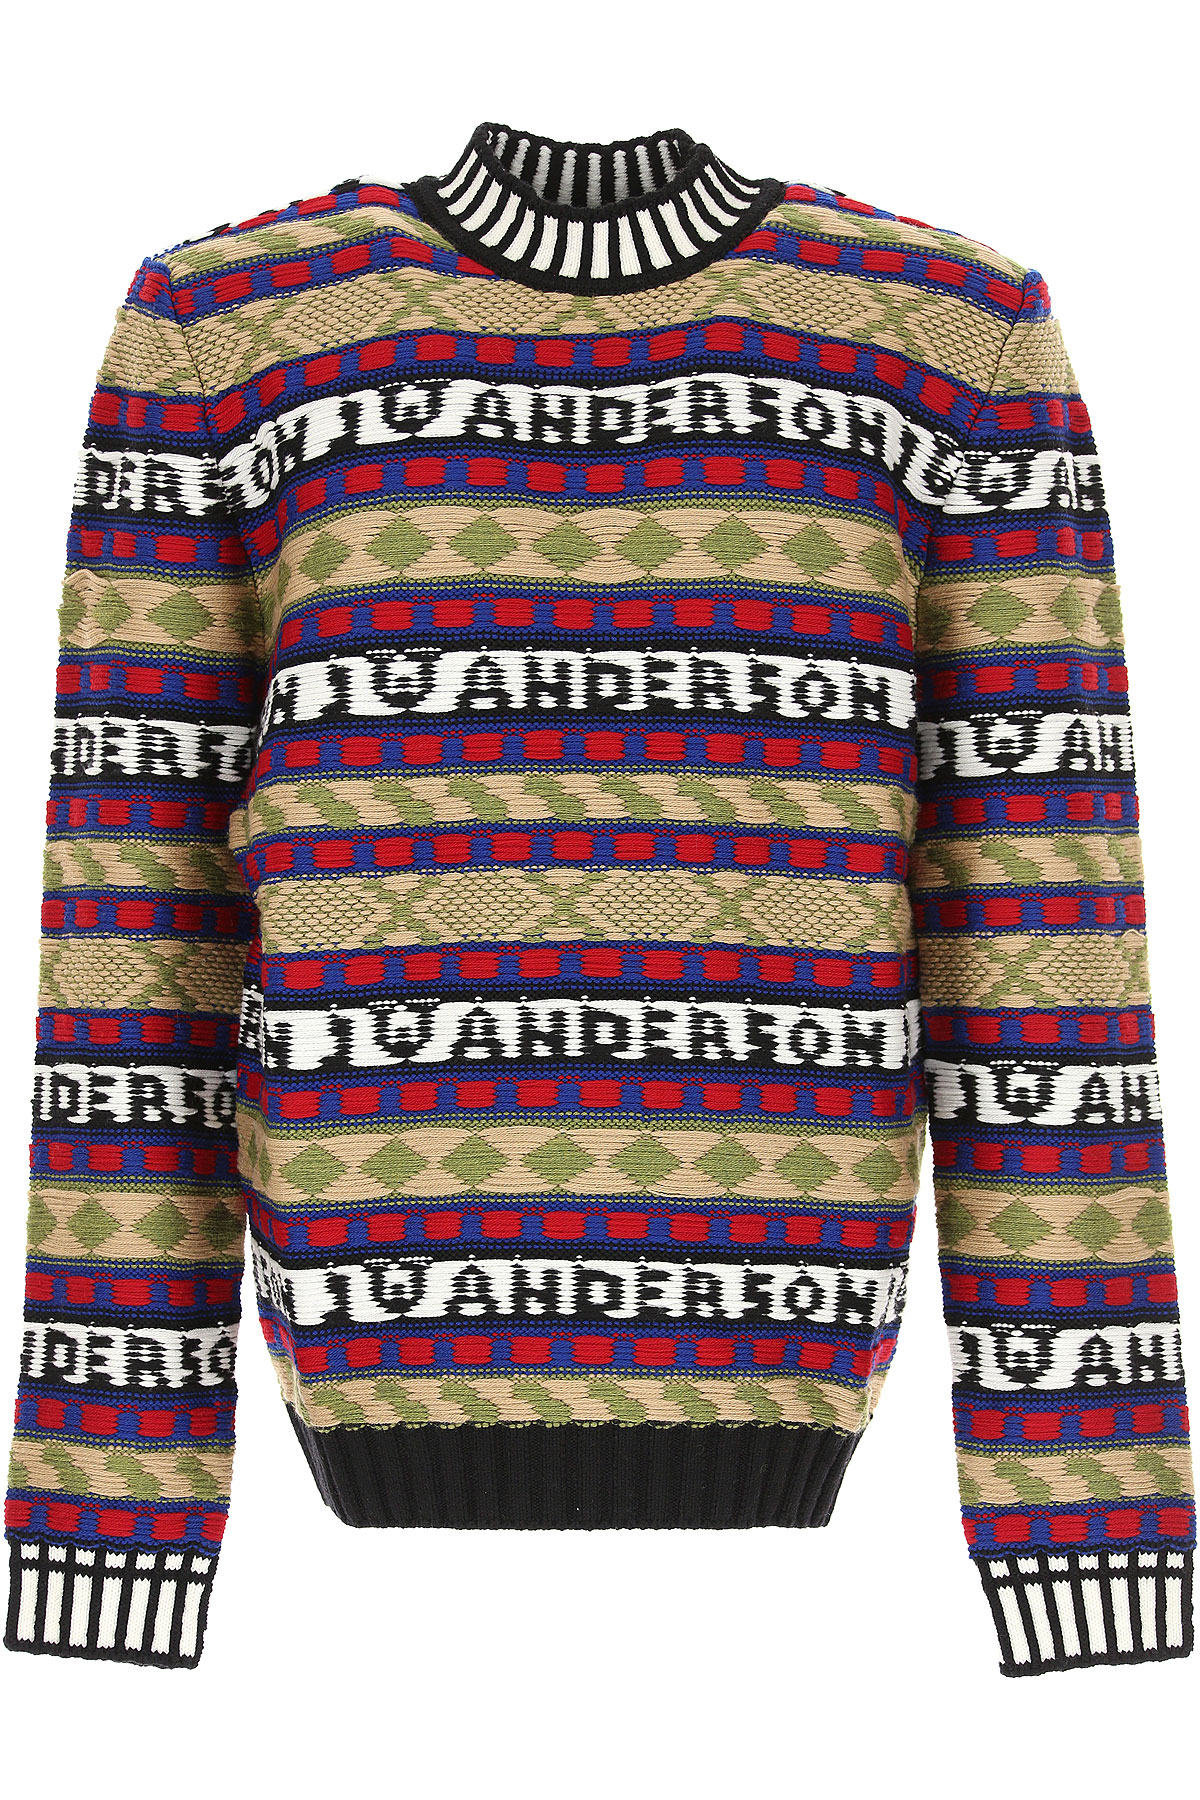 Image of J.W.Anderson Sweater for Women Jumper, Black, Extrafine Merino Wool, 2017, 6 8